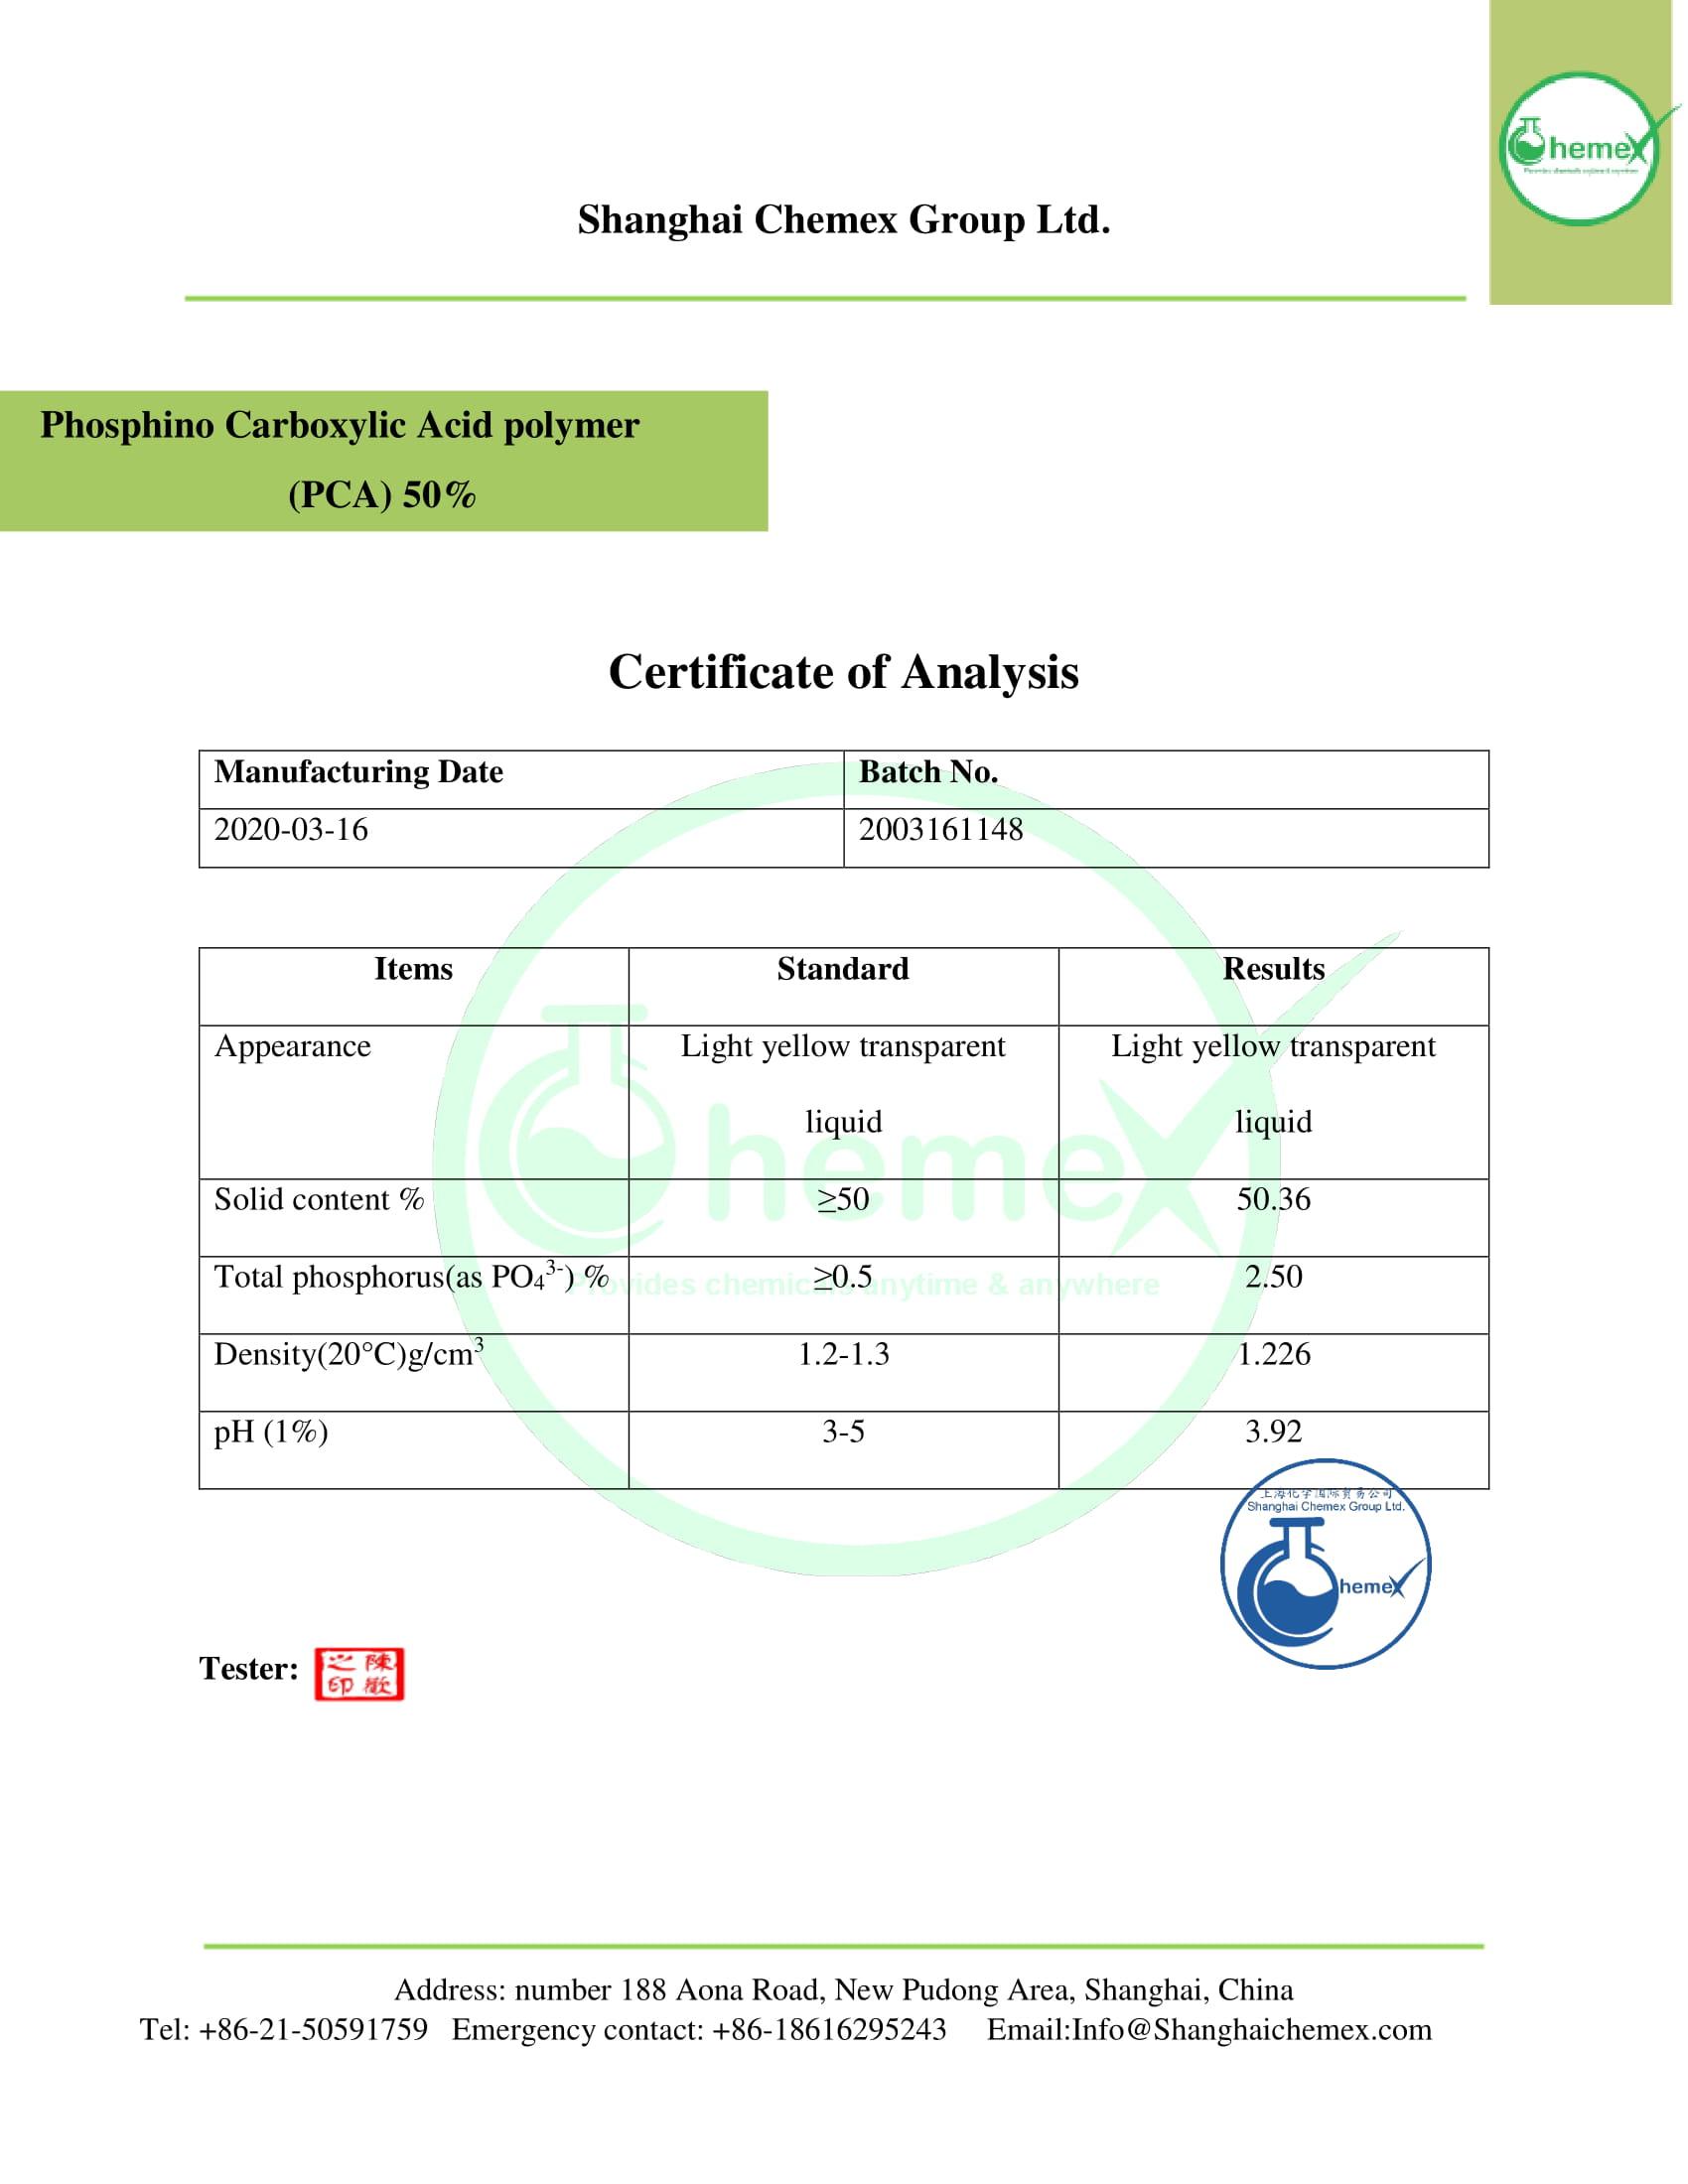 COA of (PCA) 50%.chemex-1